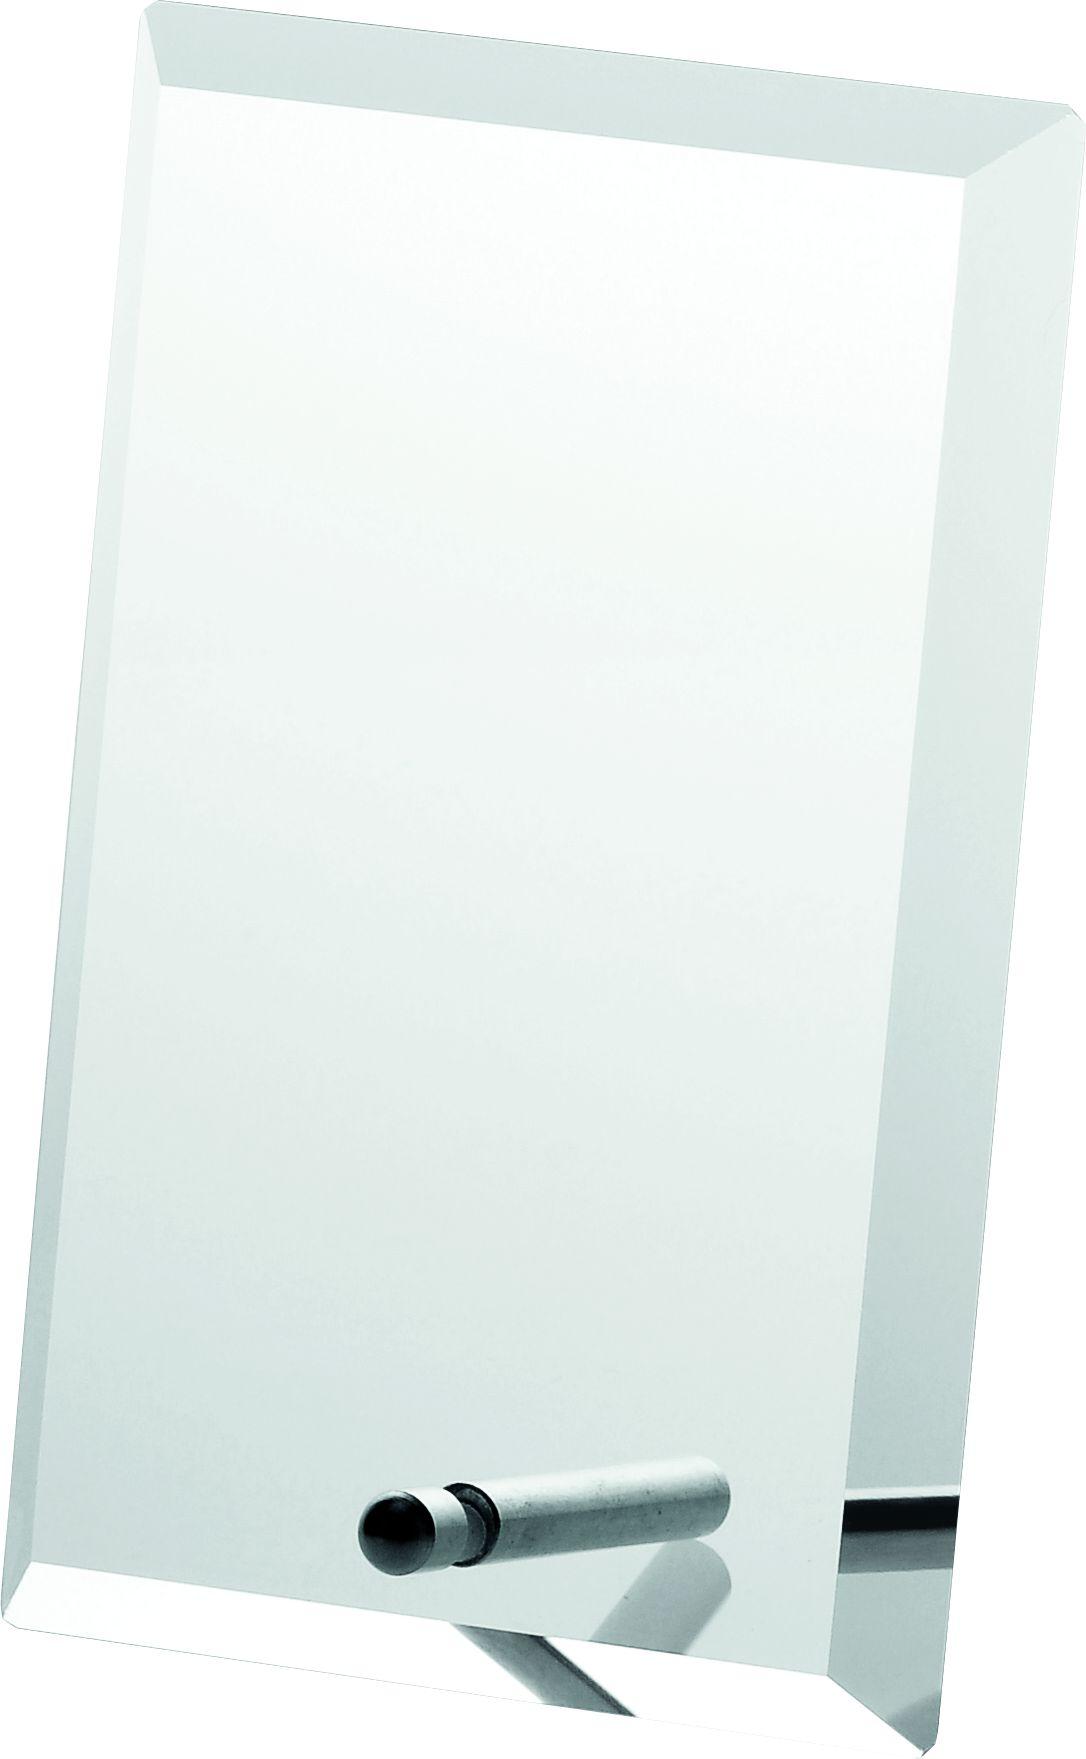 Szklana statuetka M51A, M51B, M51C